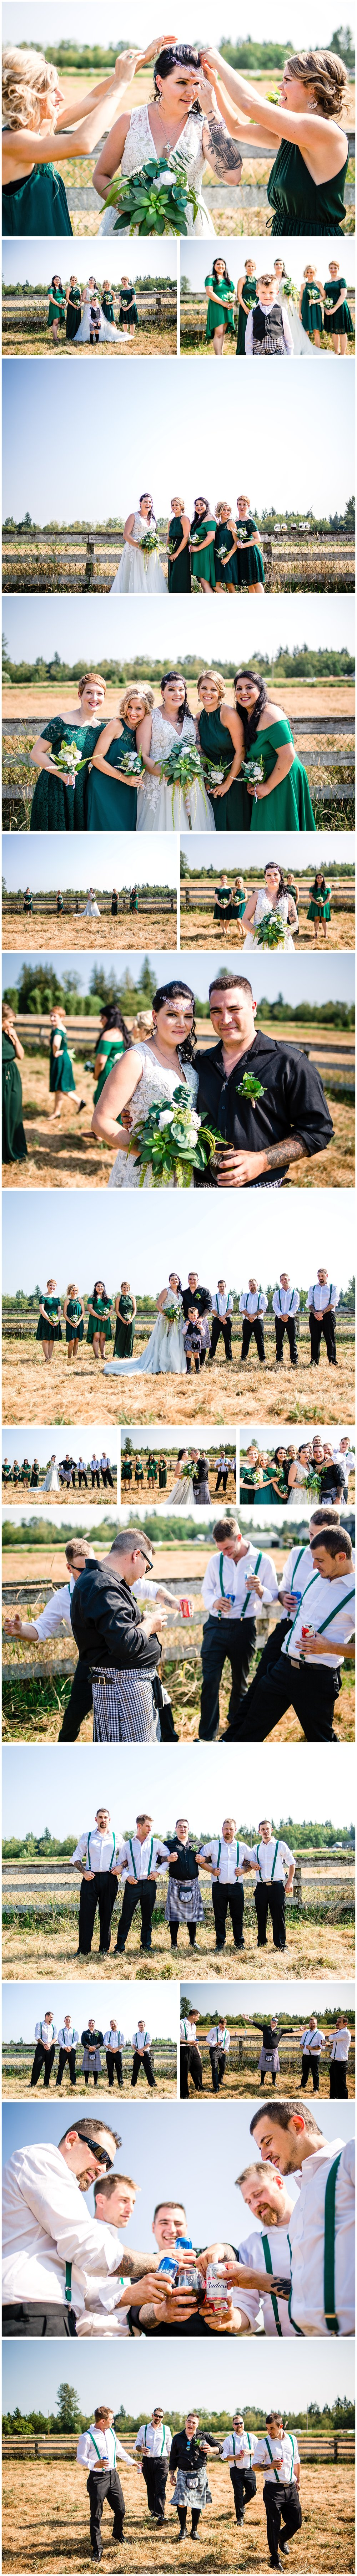 White-Owl-Barn-langley-bc-wedding-photographer-rustic-bbq-foodtruck-scottish-emerald-green-drinks_0005.jpg